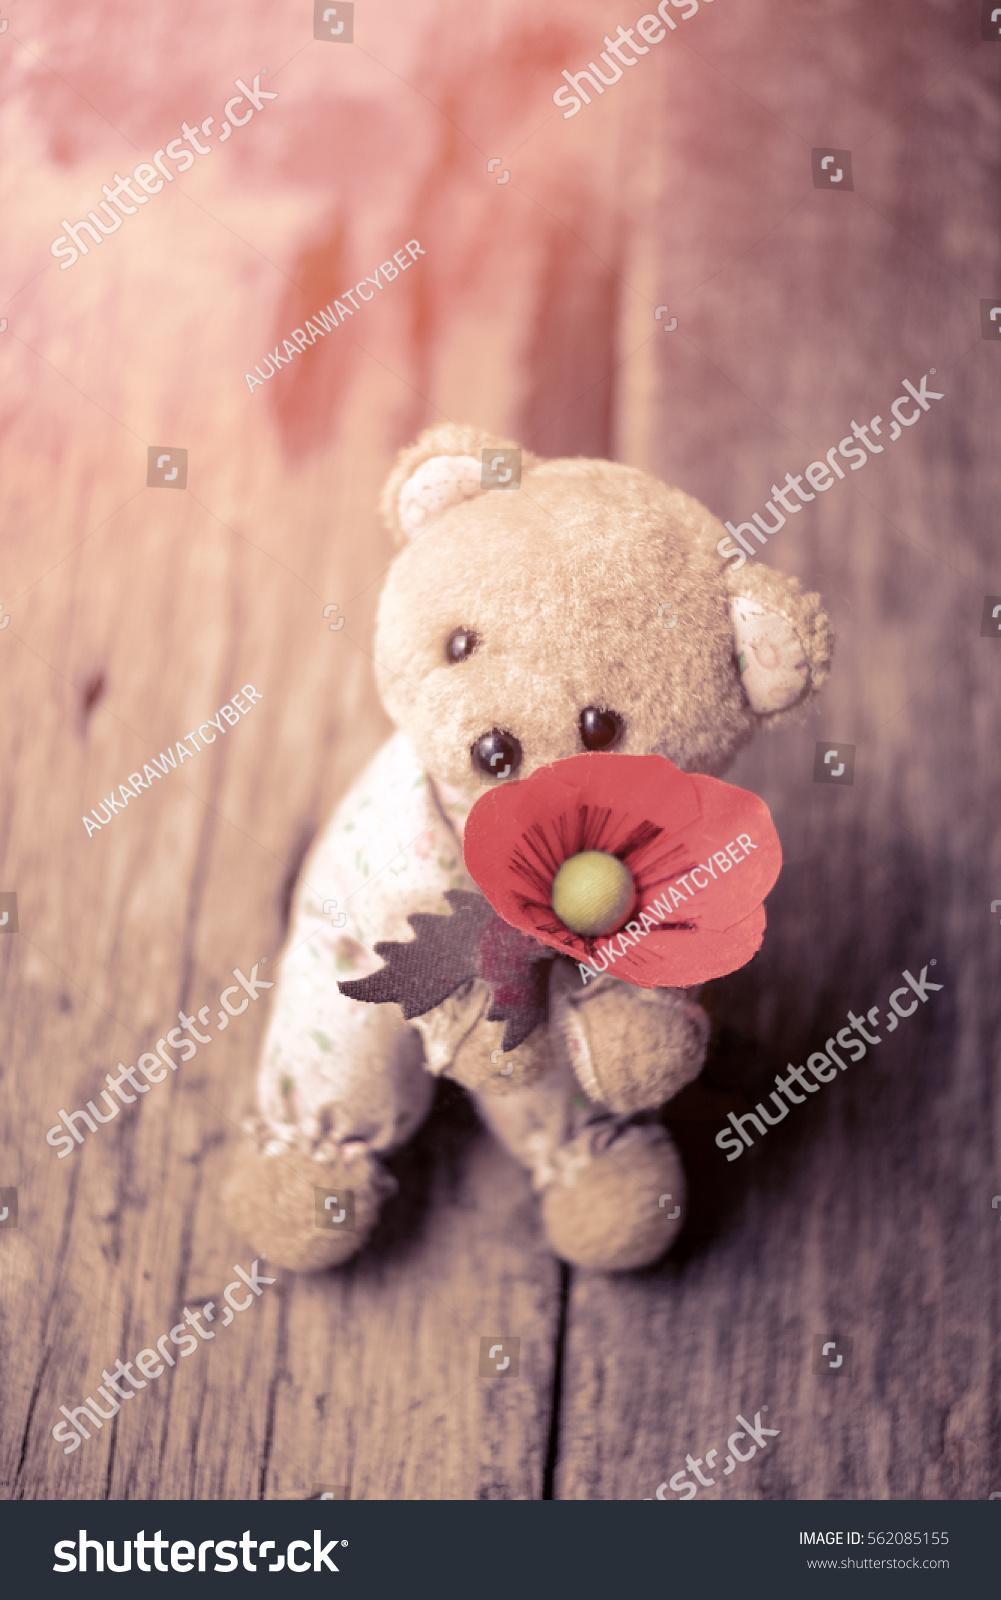 Cute Teddy Bear Doll Red Poppy Stock Photo Edit Now 562085155